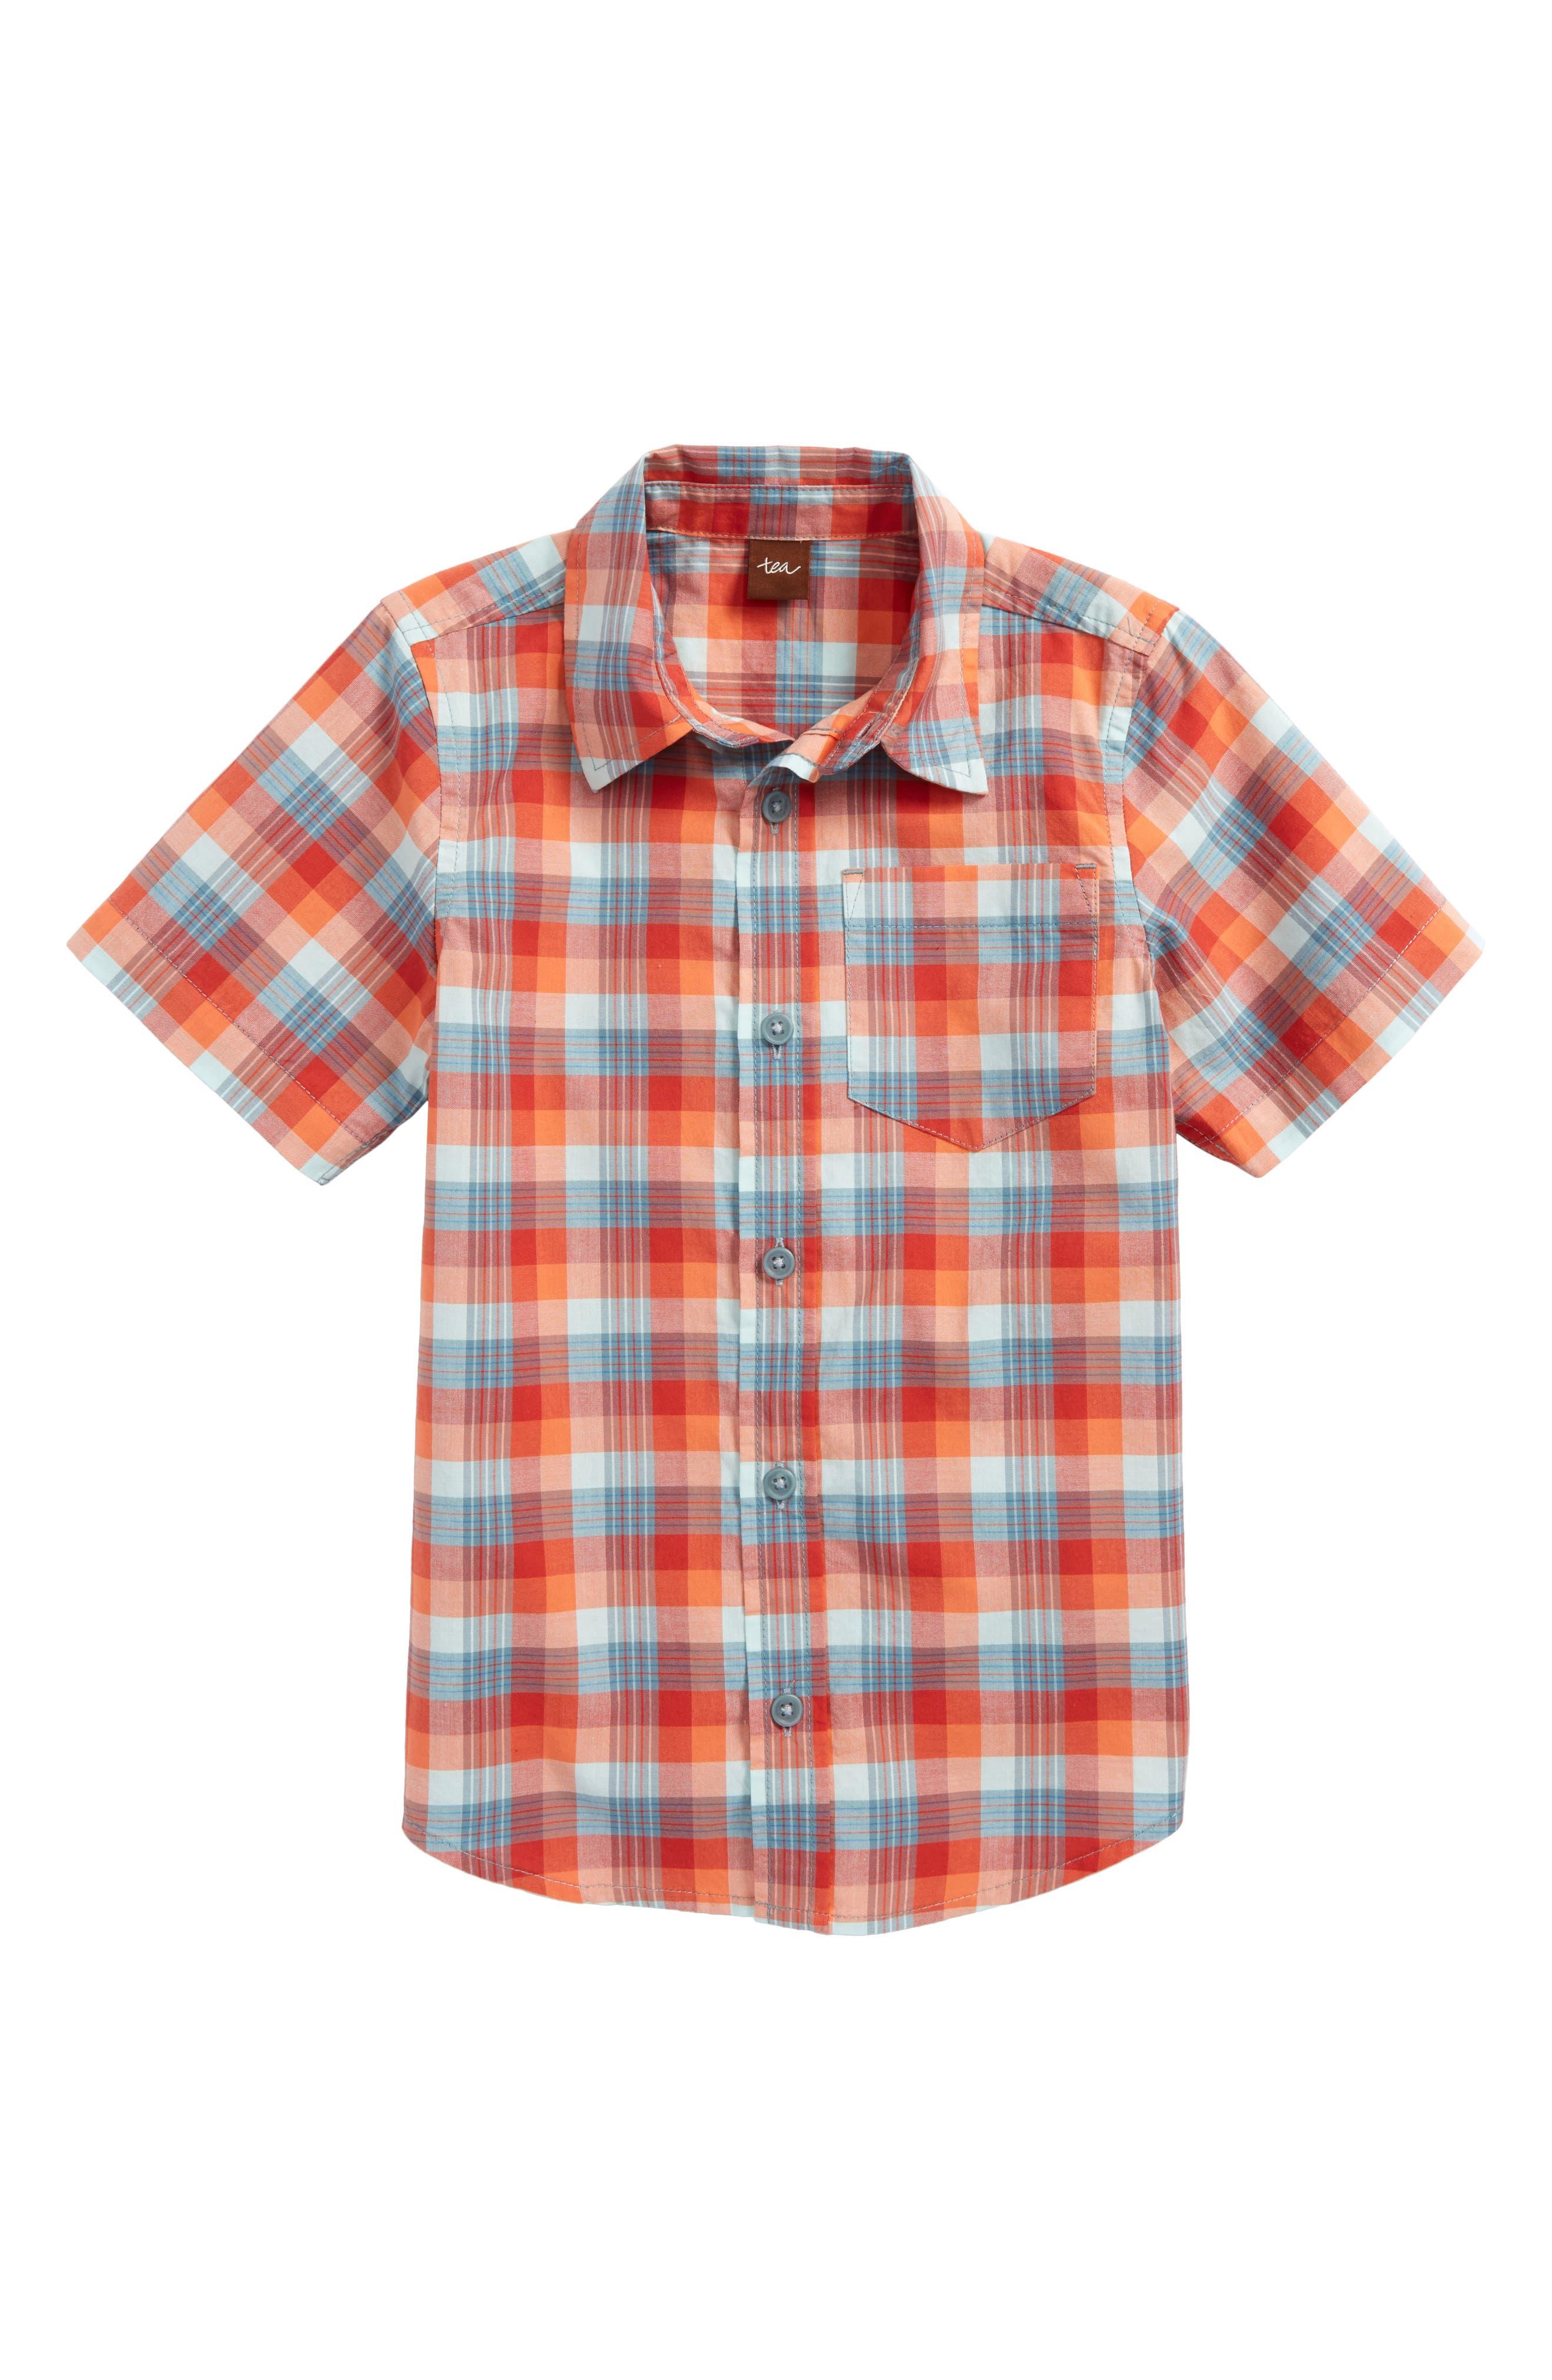 Plaid Short Sleeve Shirt,                             Main thumbnail 1, color,                             618